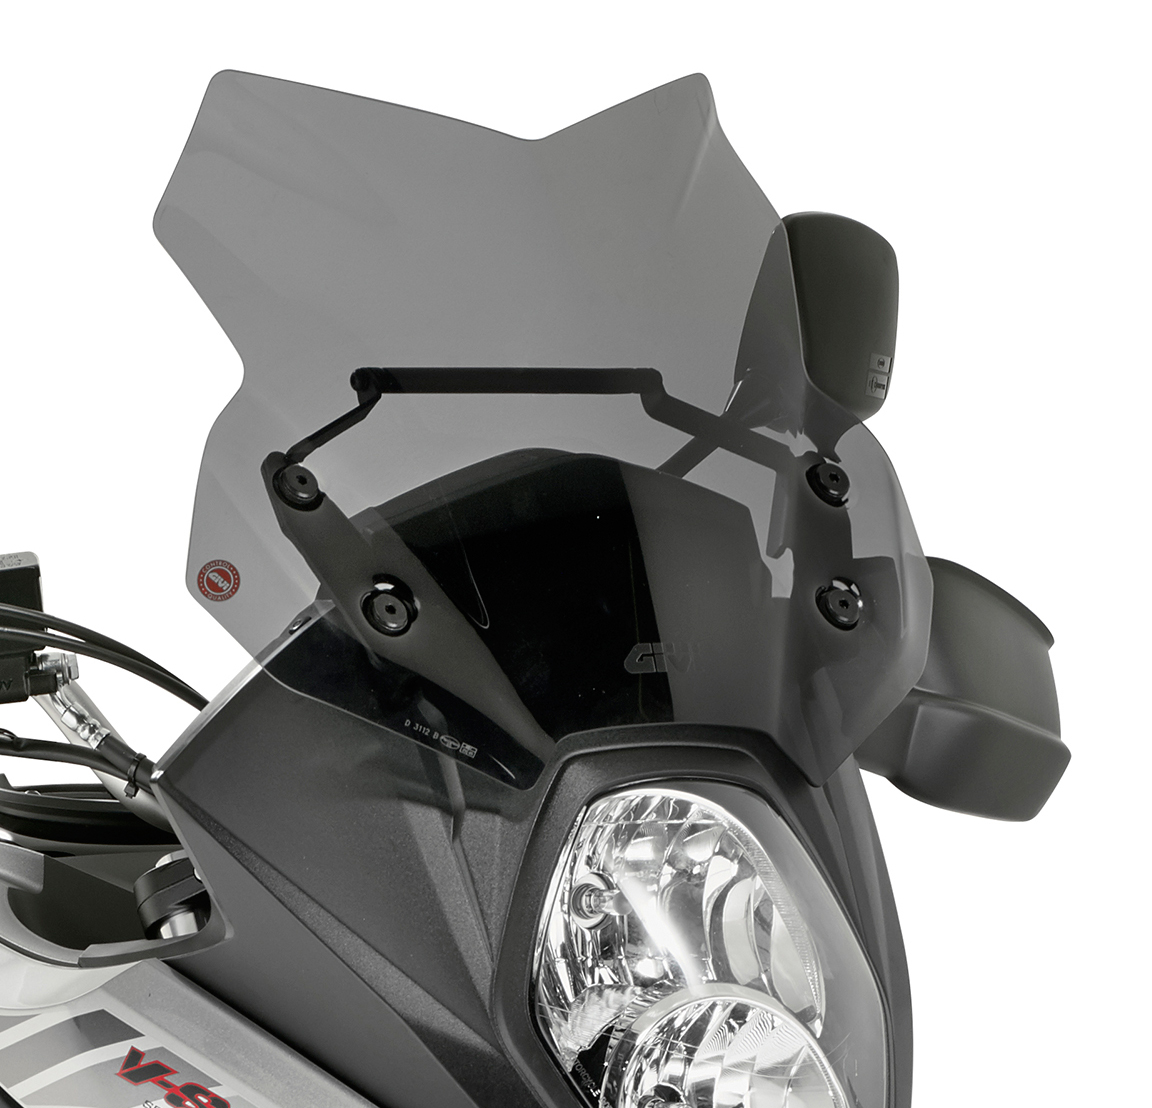 GIVI AF3112 Airflow Windscreen for Suzuki V-Strom 650 17-18 Clear